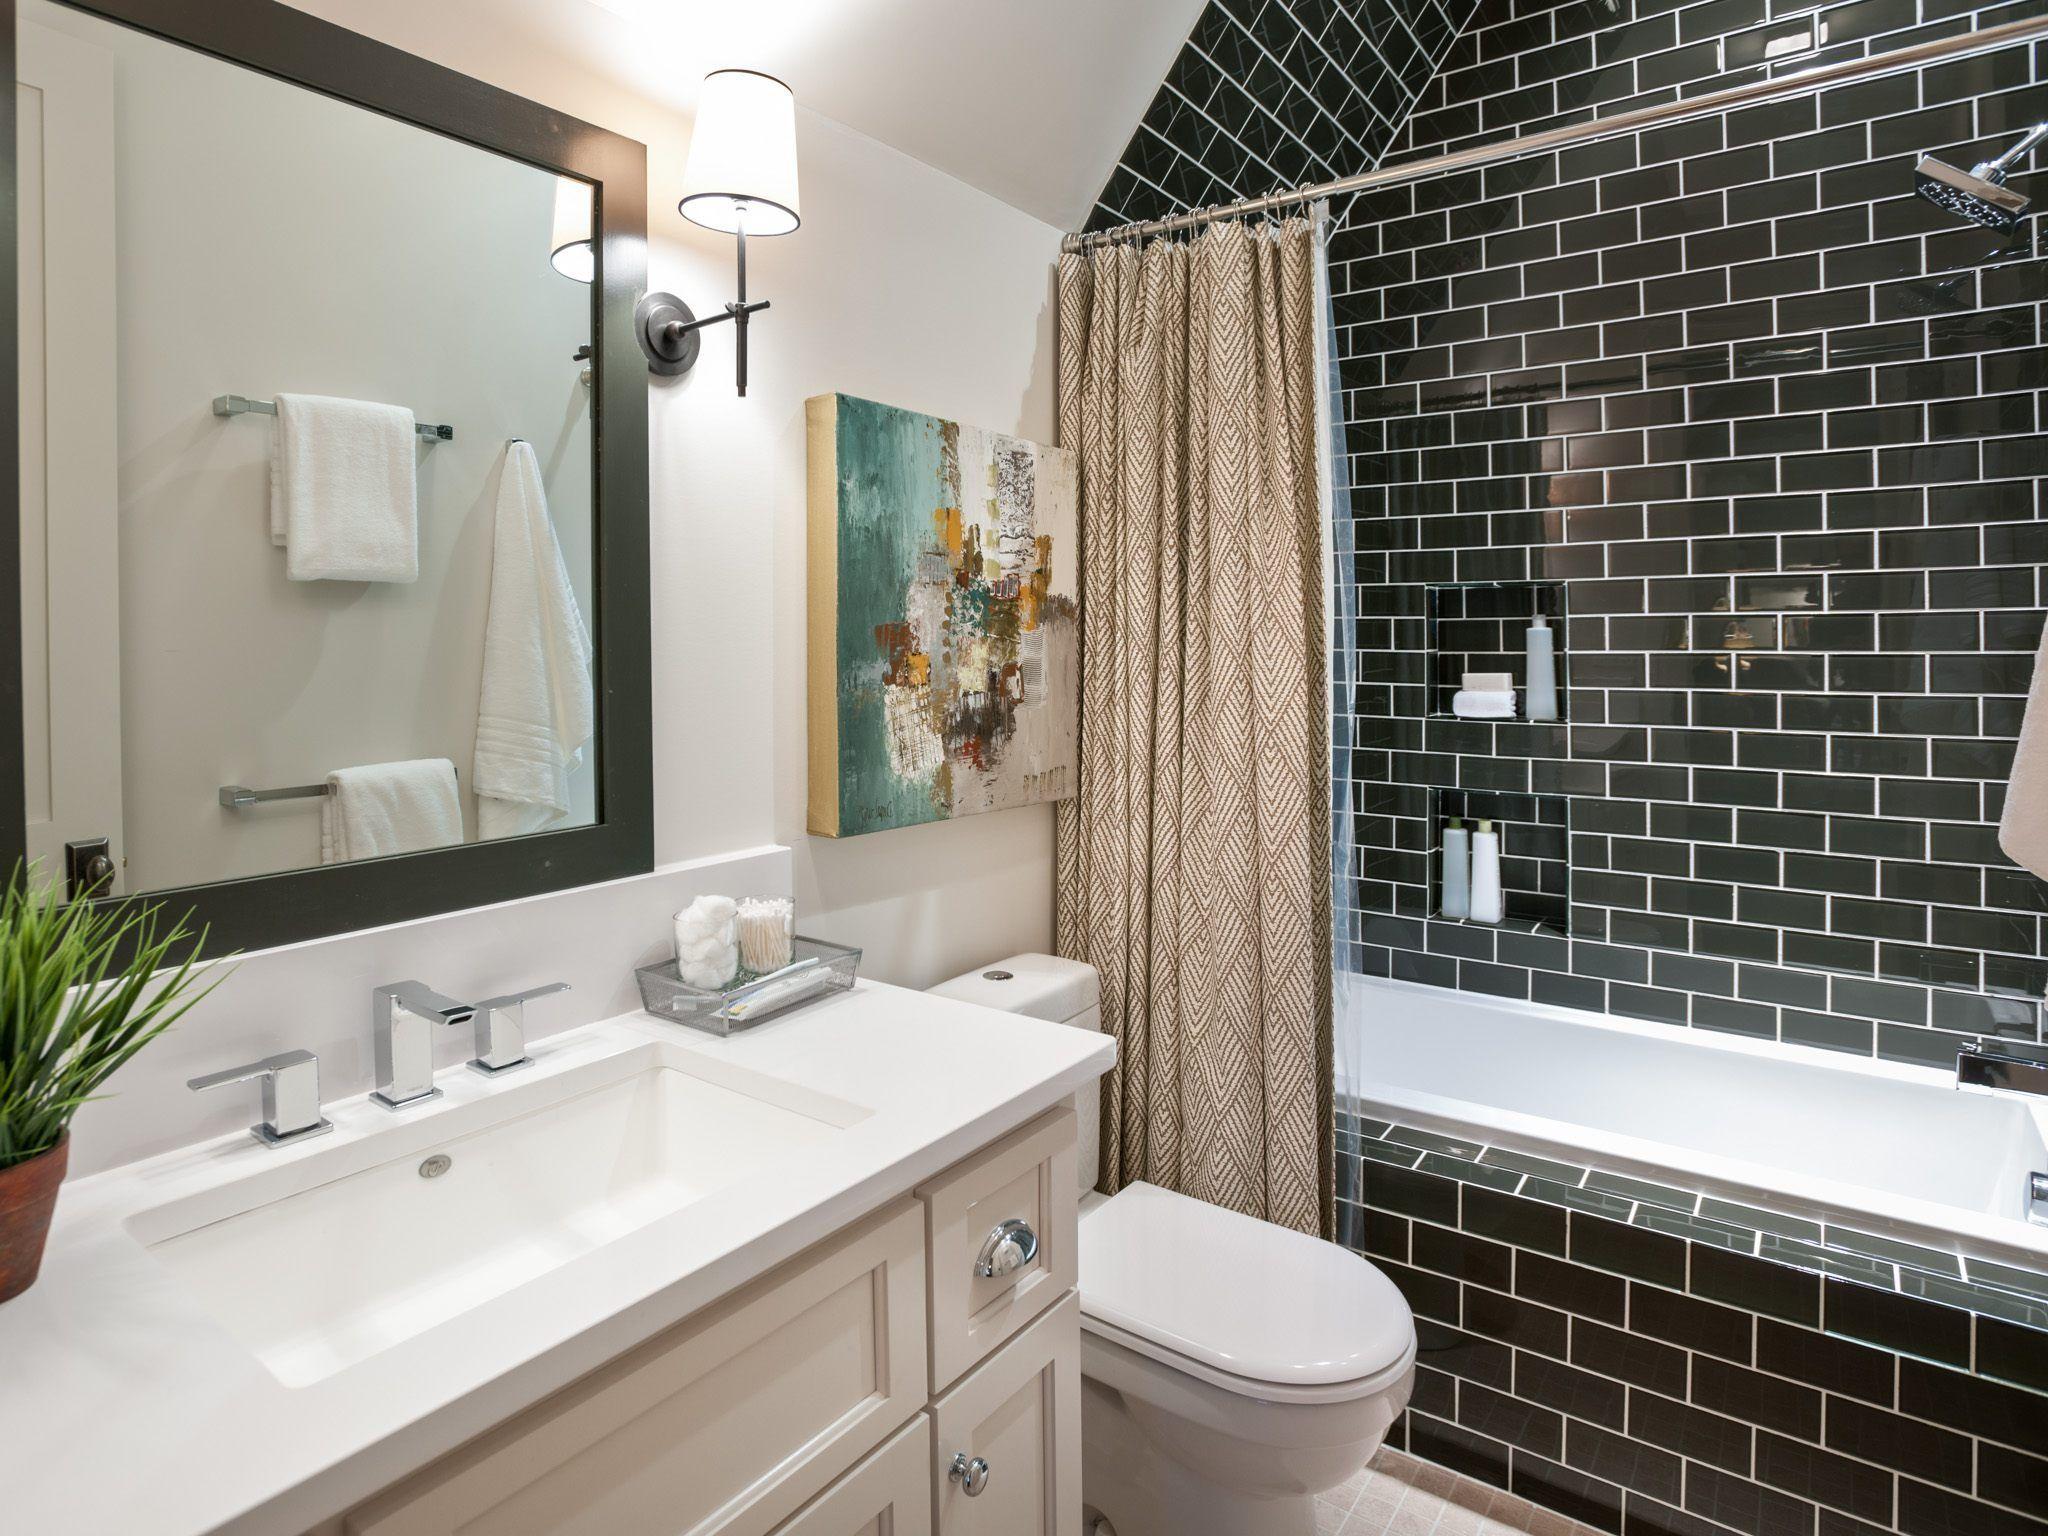 excellent mid century modern bathroom vanity pattern-Unique Mid Century Modern Bathroom Vanity Wallpaper